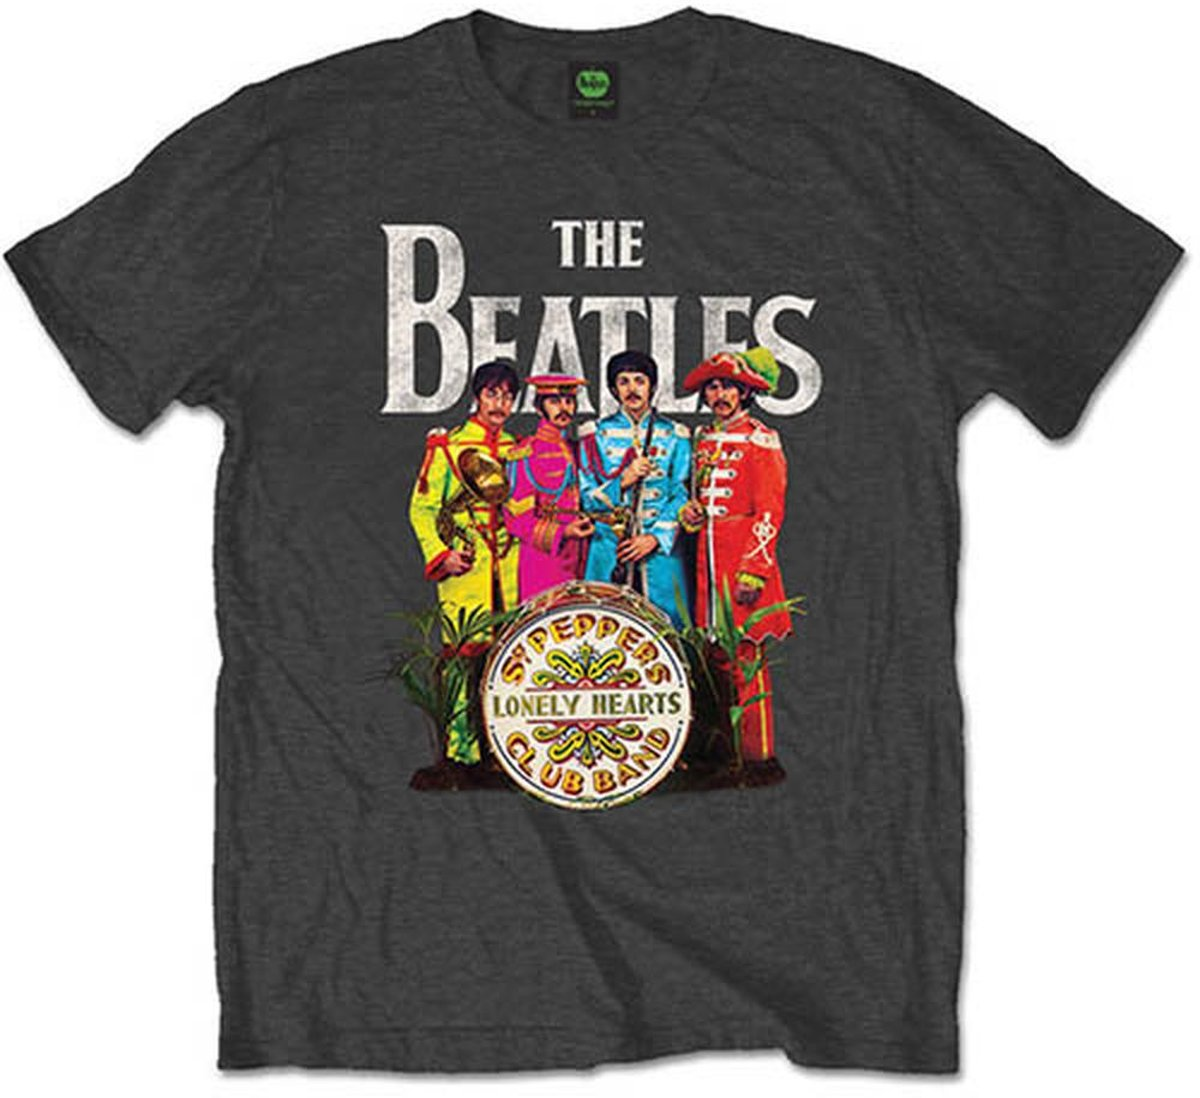 Afbeelding van product The Beatles Sgt Pepper Charcoal Mens TS: Large  - maat L